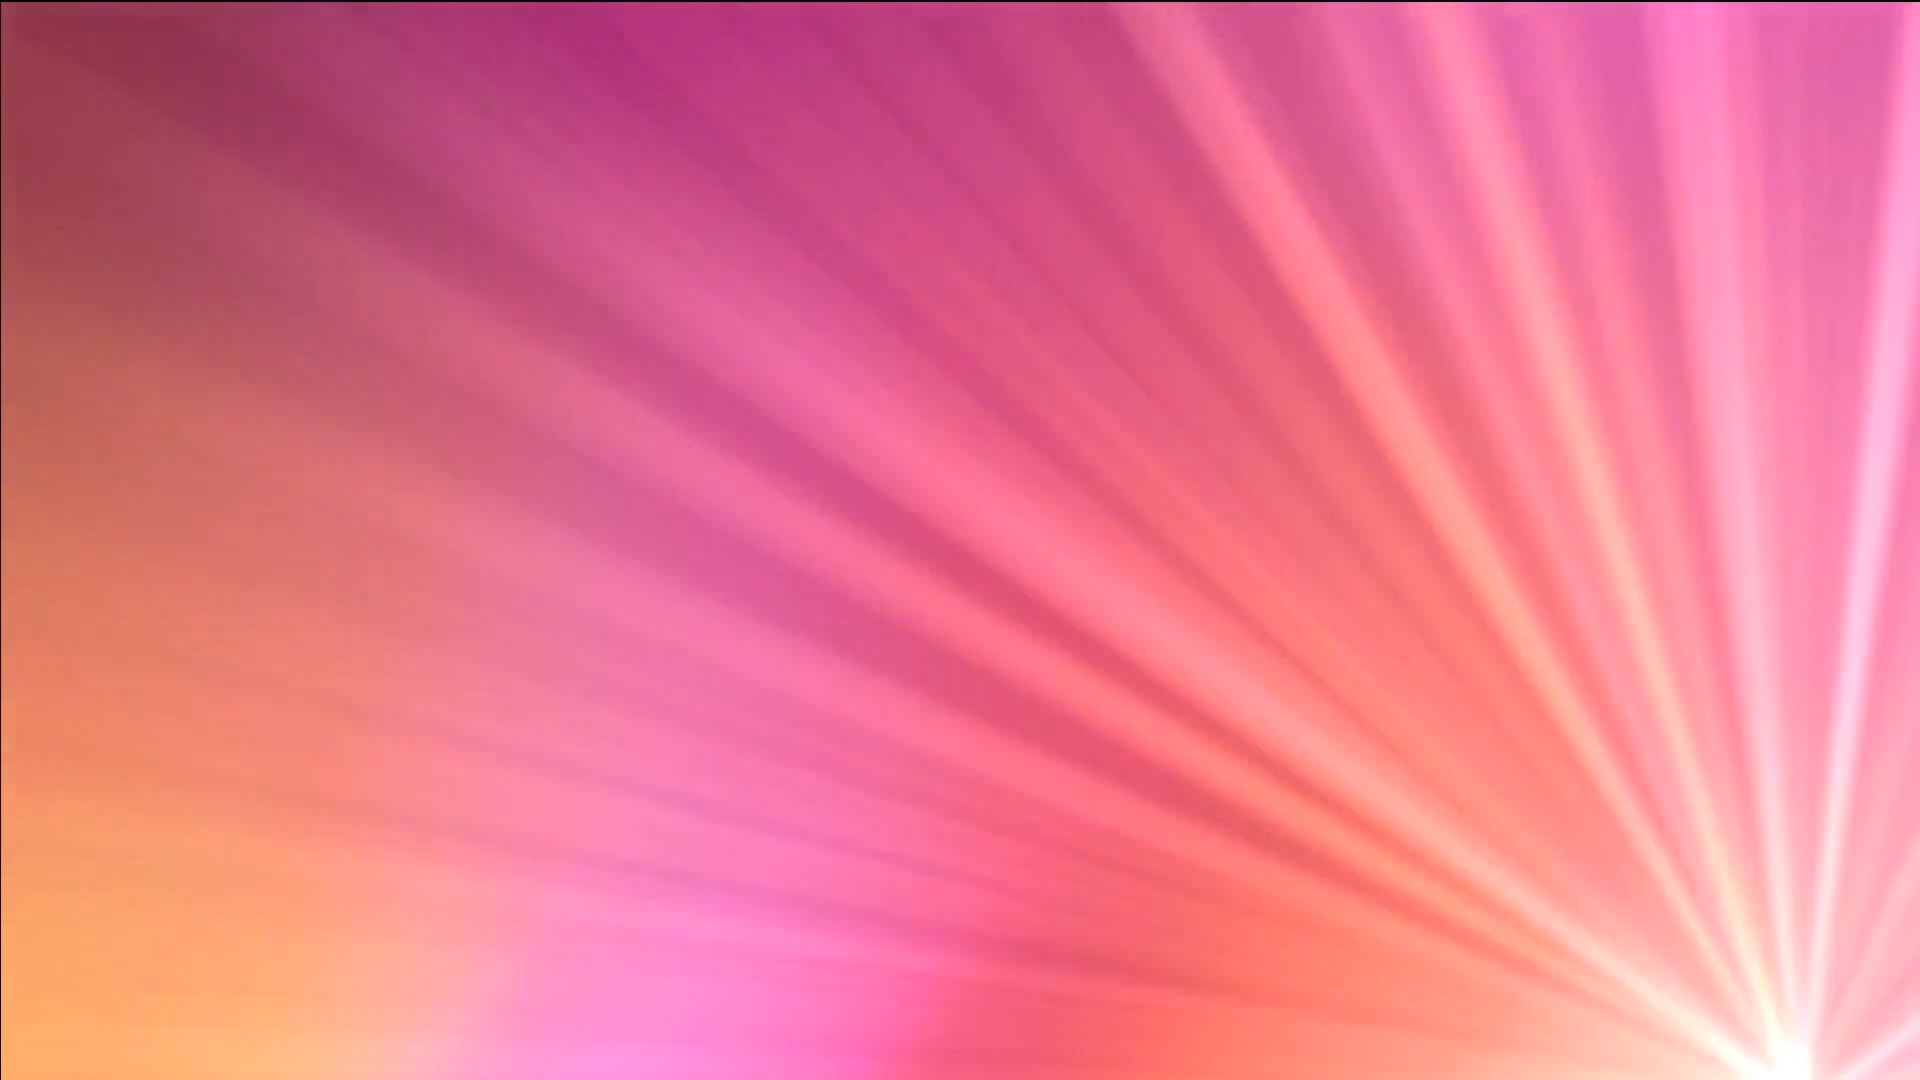 Download 7800 Background Foto Video HD Gratis